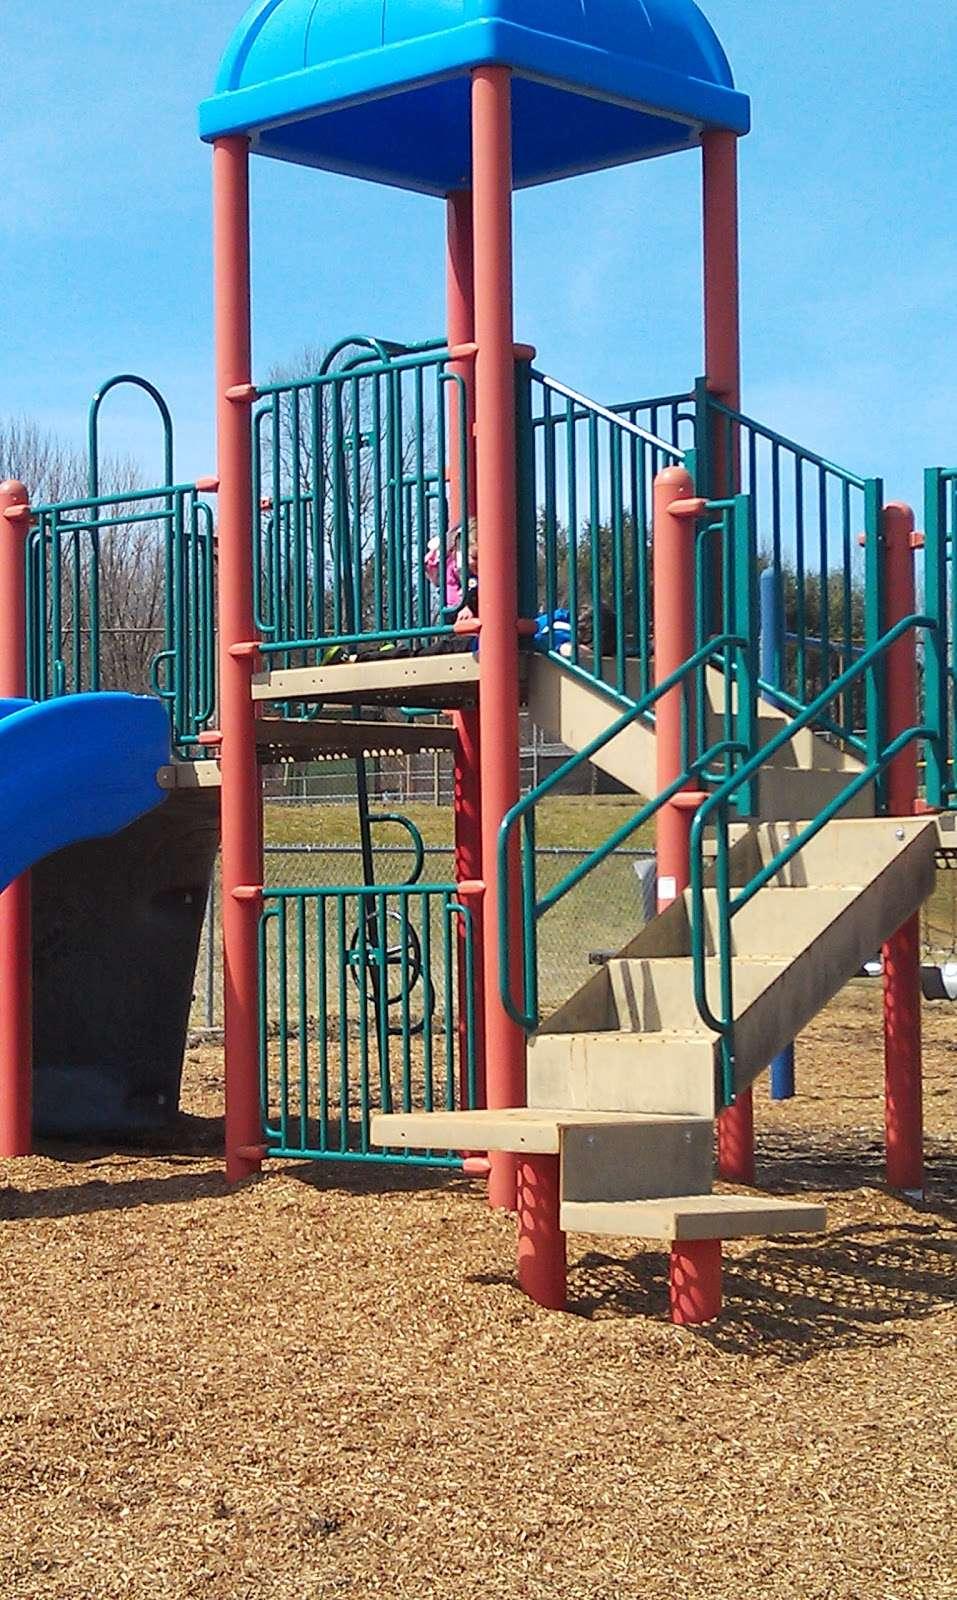 Heistein Park - park  | Photo 2 of 10 | Address: Randolph, NJ 07869, USA | Phone: (973) 989-7100